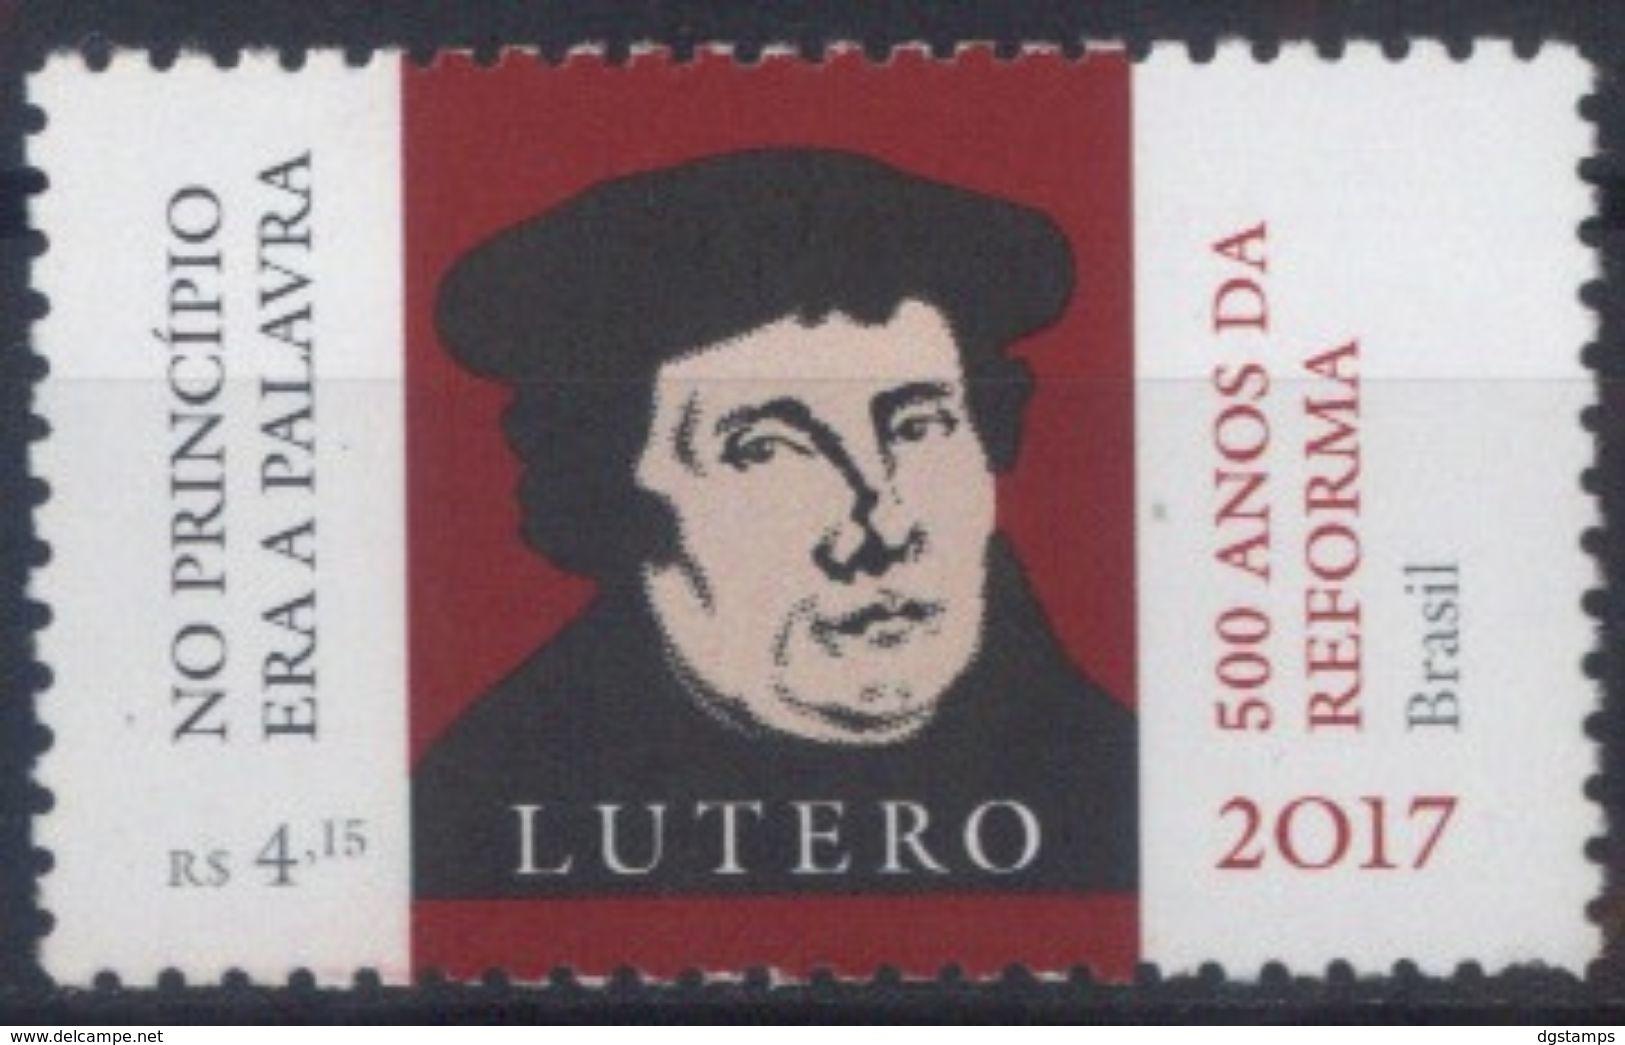 Brasil 2017 ** 500 Años De La Reforma Luterana. See Desc. - Brazil